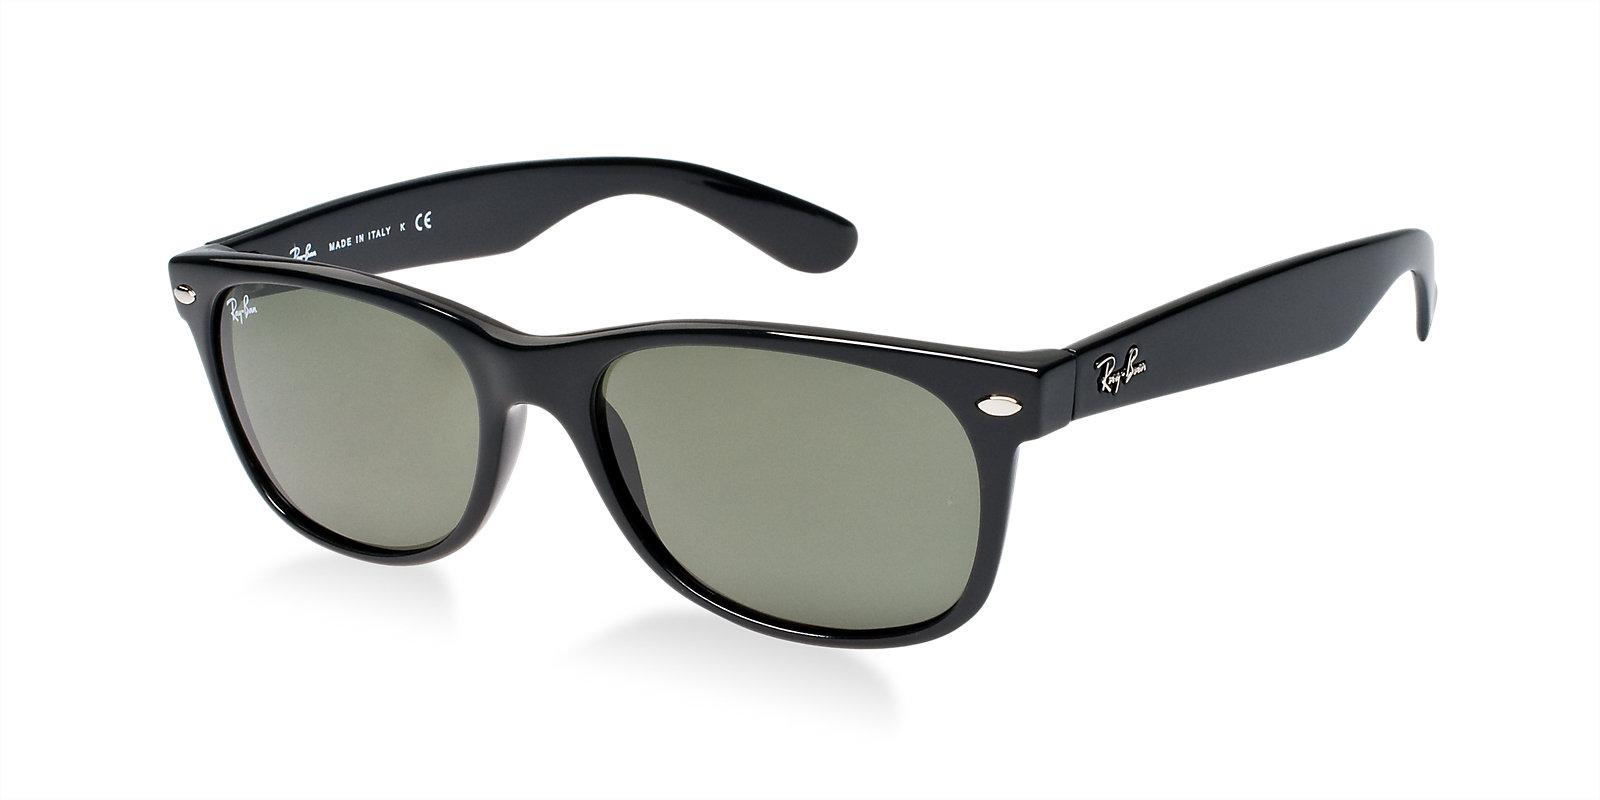 Ray Ban Rb2132 901 Black New Wayfarer Sunglasses Lux Eyewear